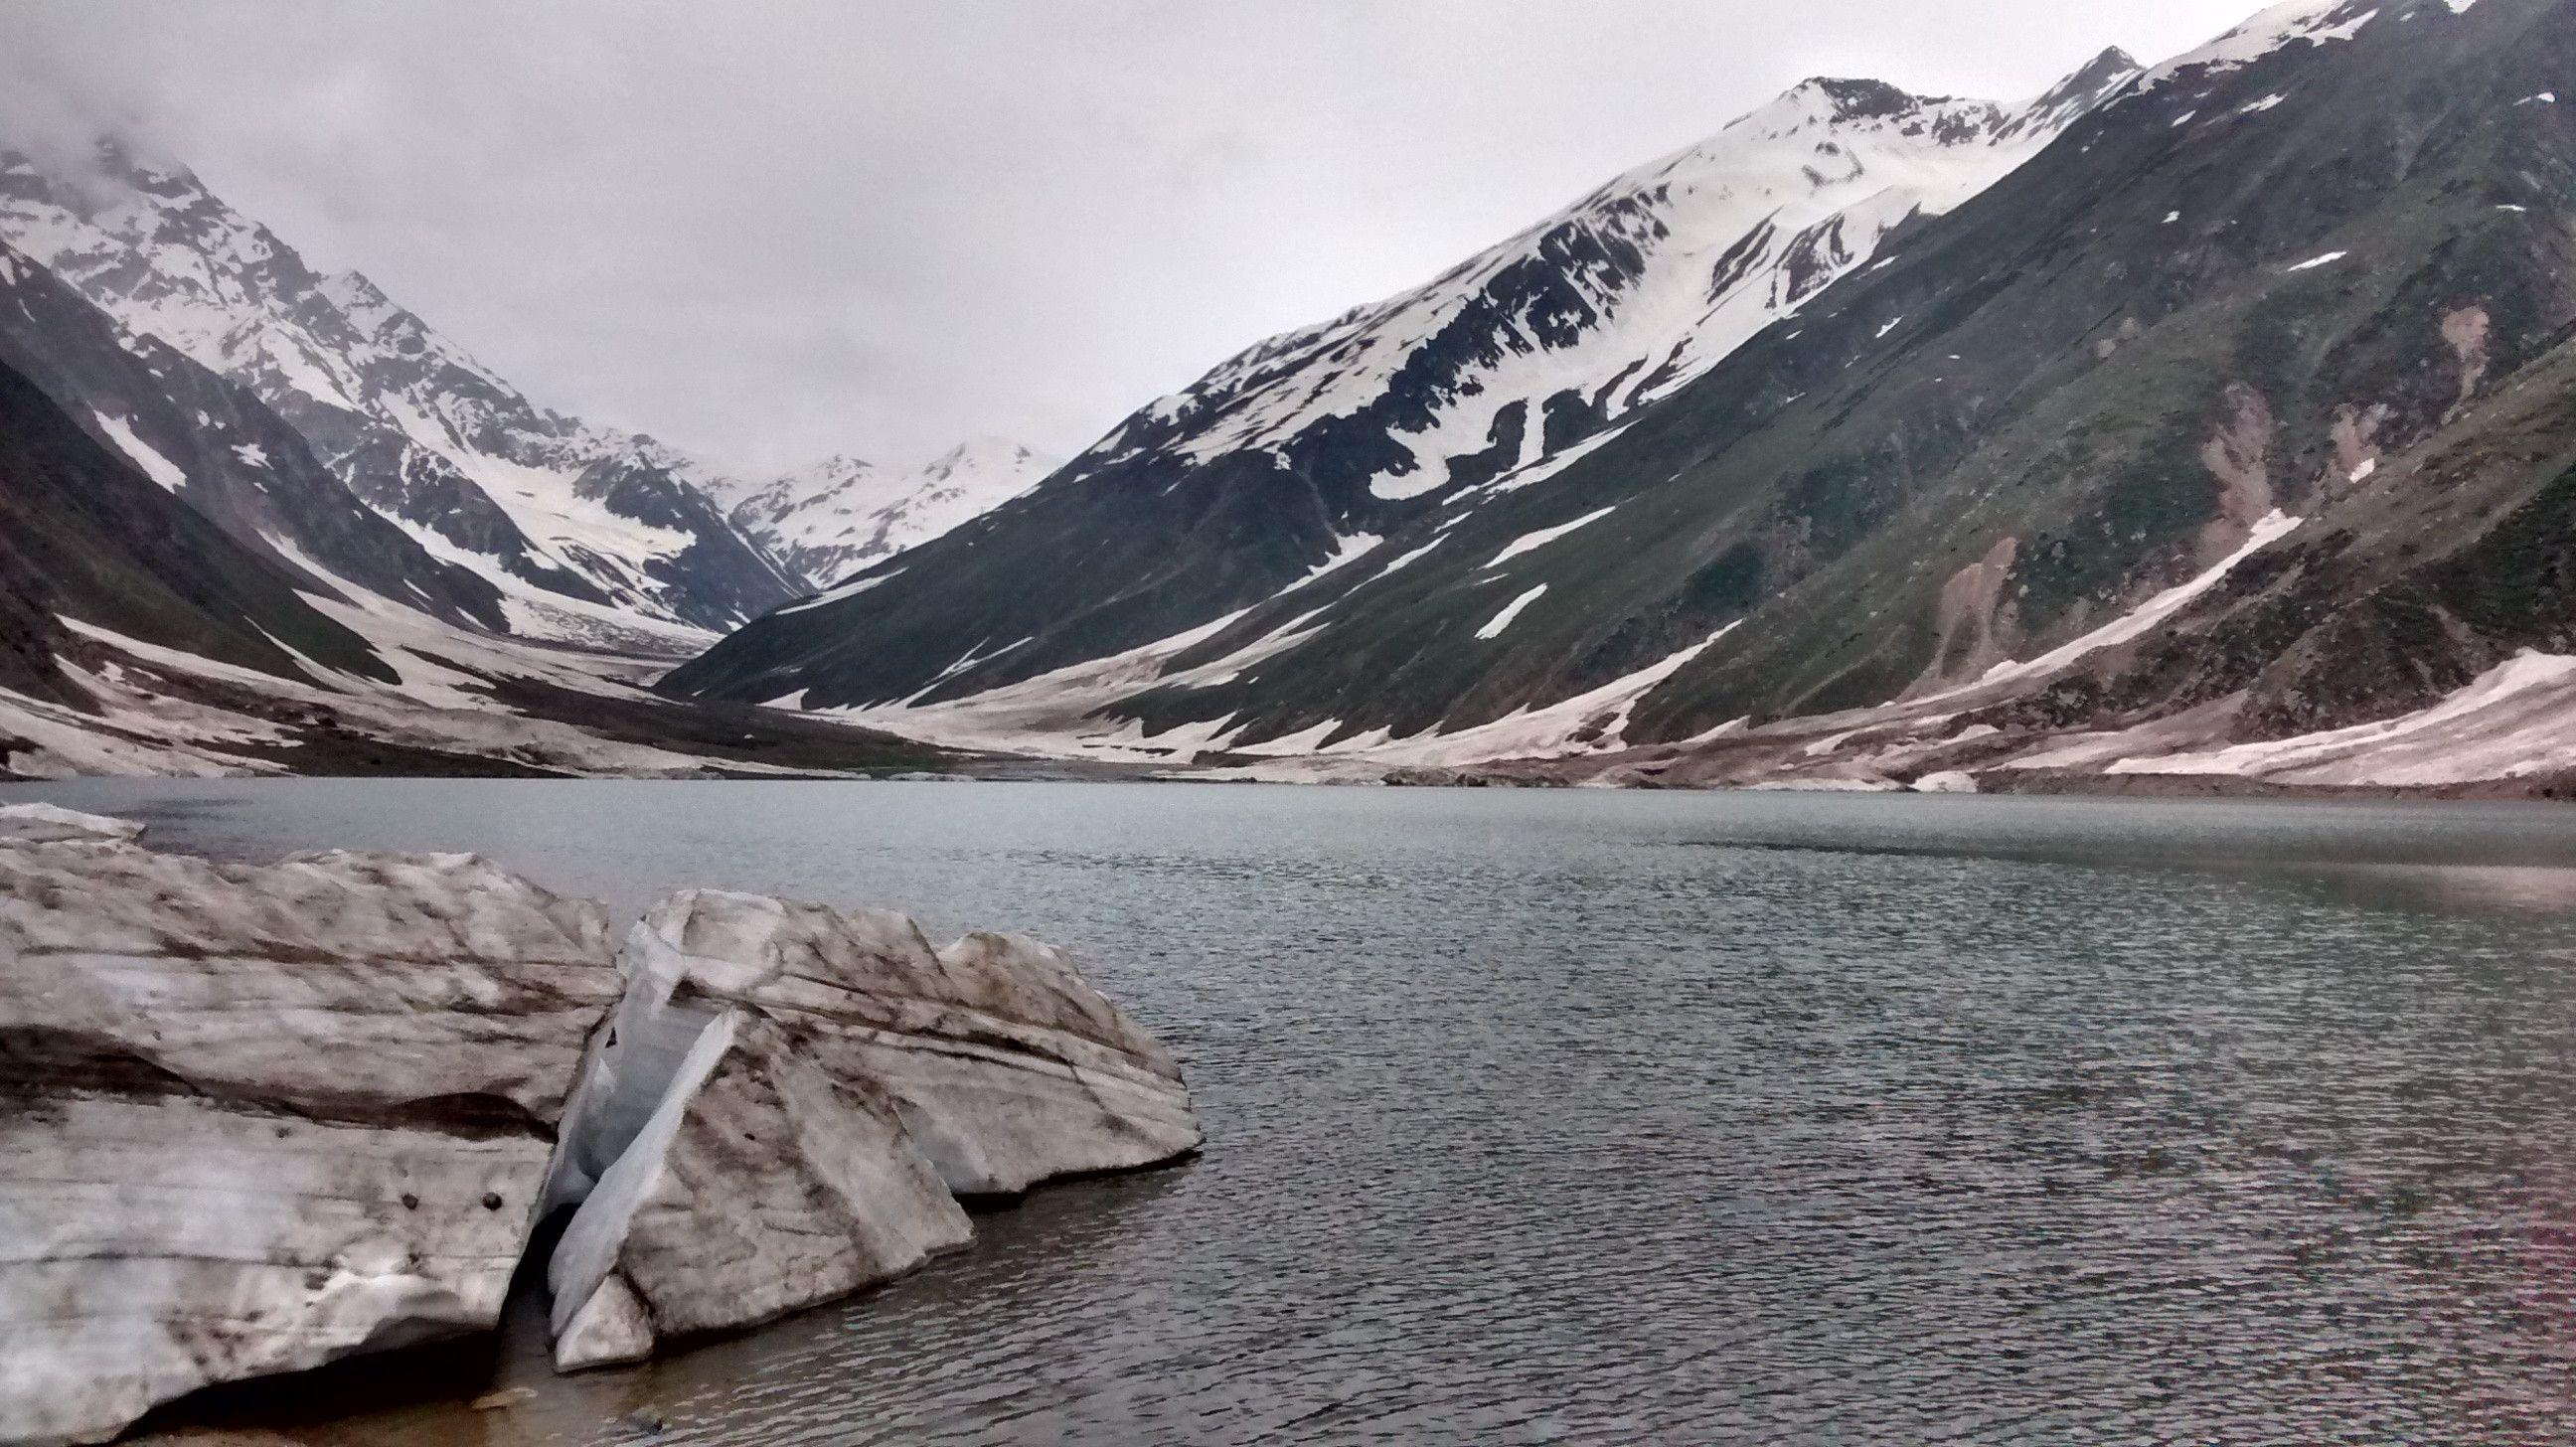 Lake Saif-ul-Malook Pakistan. (OC) [2592x1456] http://ift.tt/29c6g5o